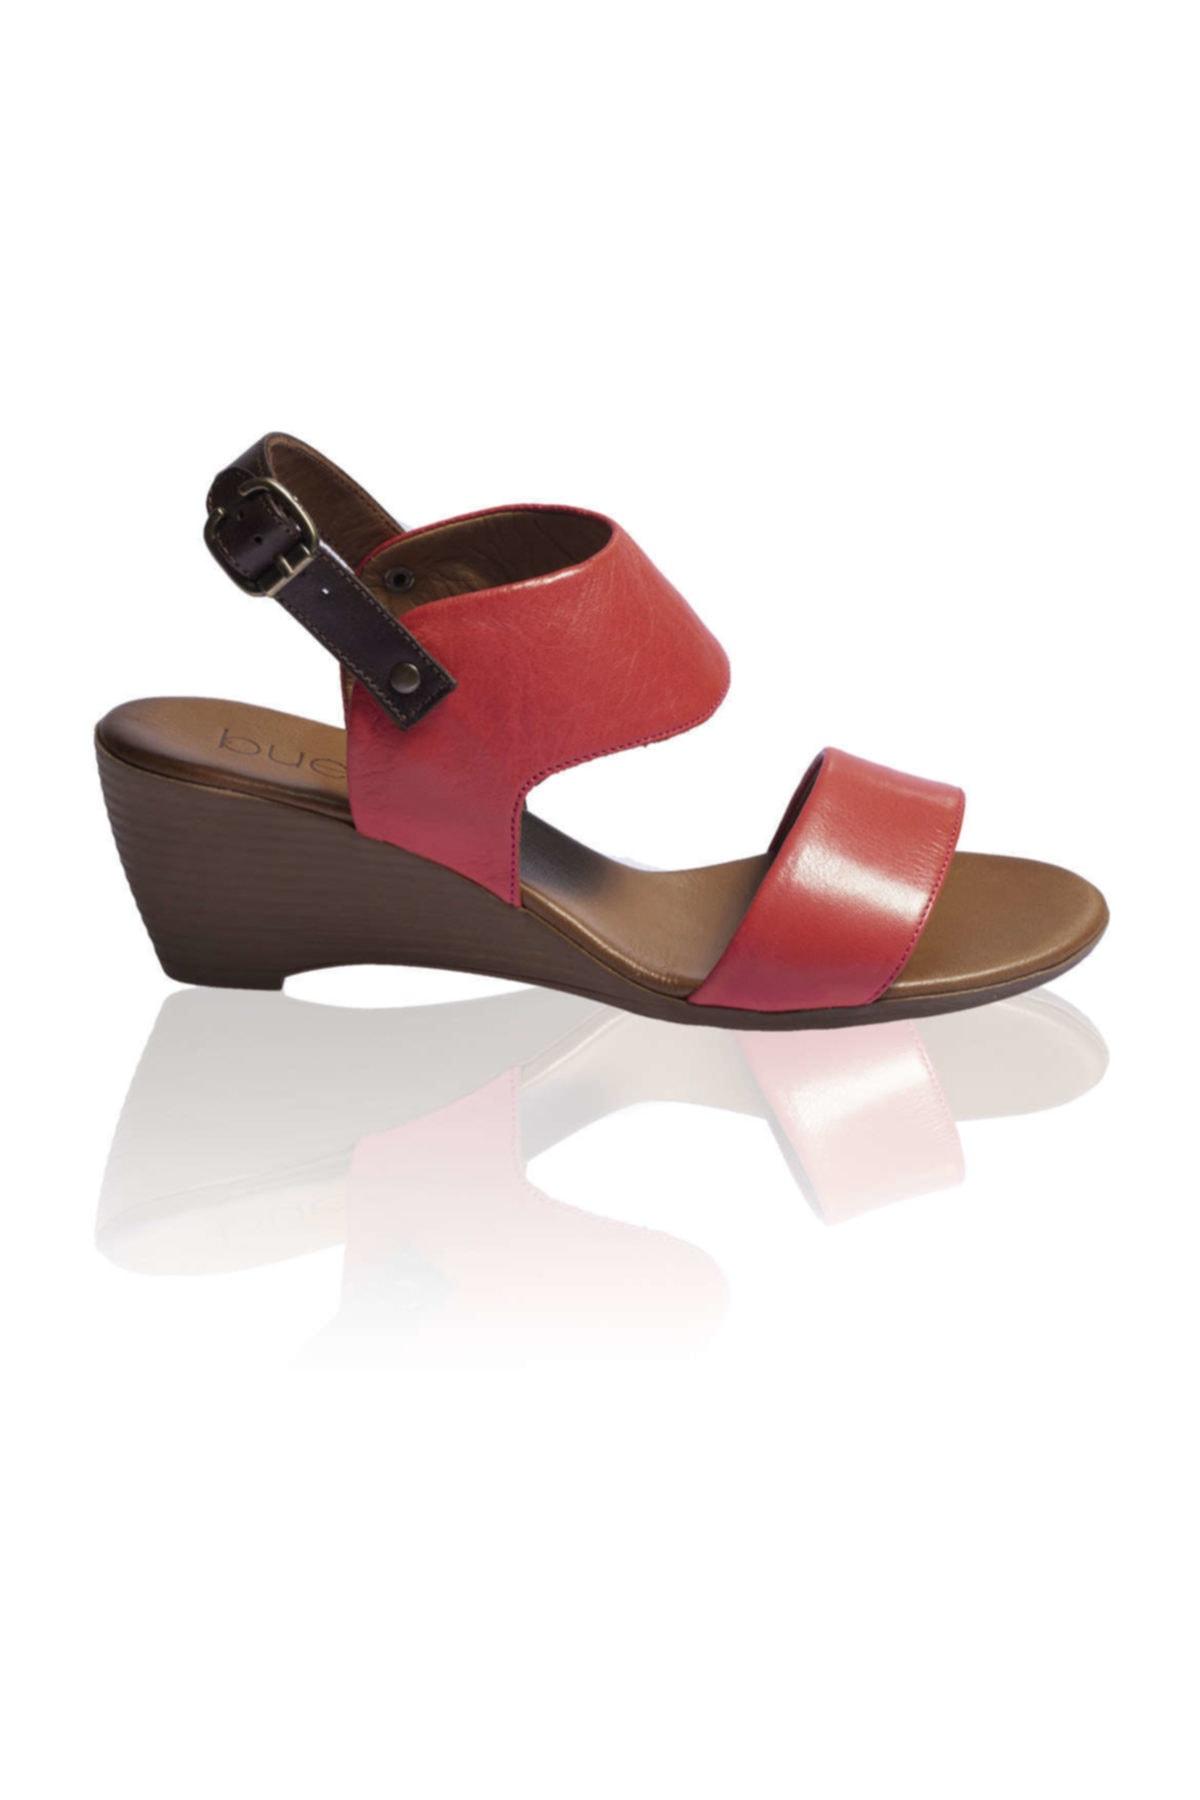 BUENO Shoes Kırmızı Bayan Sandalet 9n3700 1